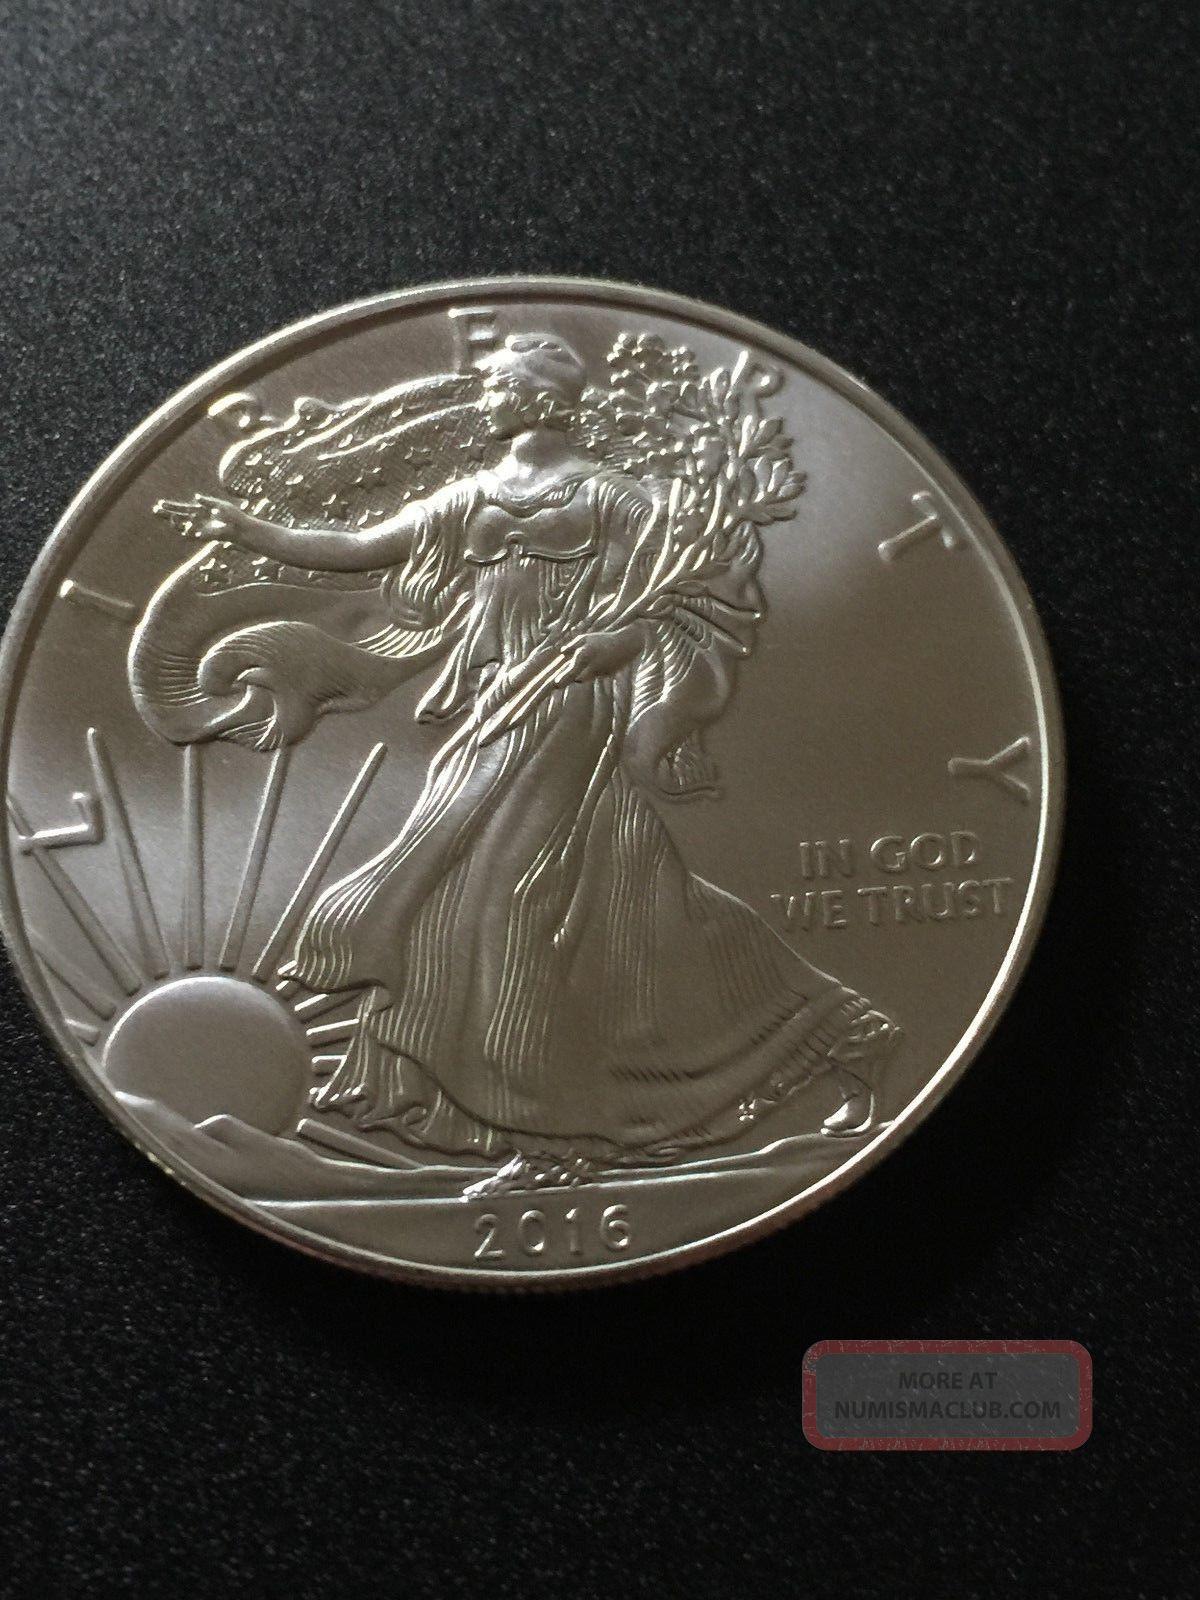 2016 American Eagle Liberty Usa 1 Troy Oz 999 Silver